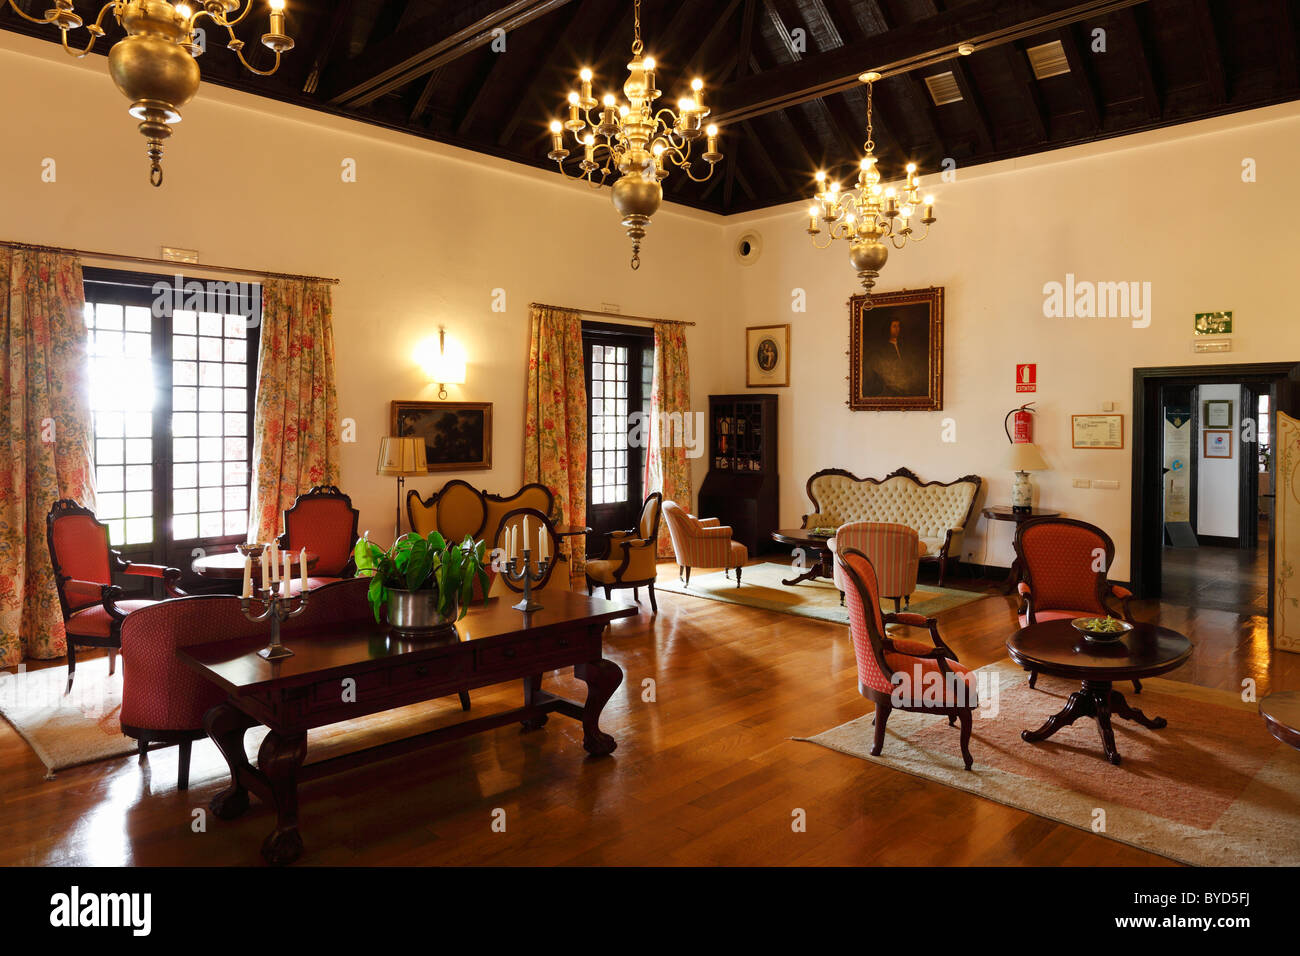 Salon presso l'Hotel Parador de Turismo Conde de La Gomera, San Sebatián de La Gomera, isole Canarie, Spagna, Immagini Stock